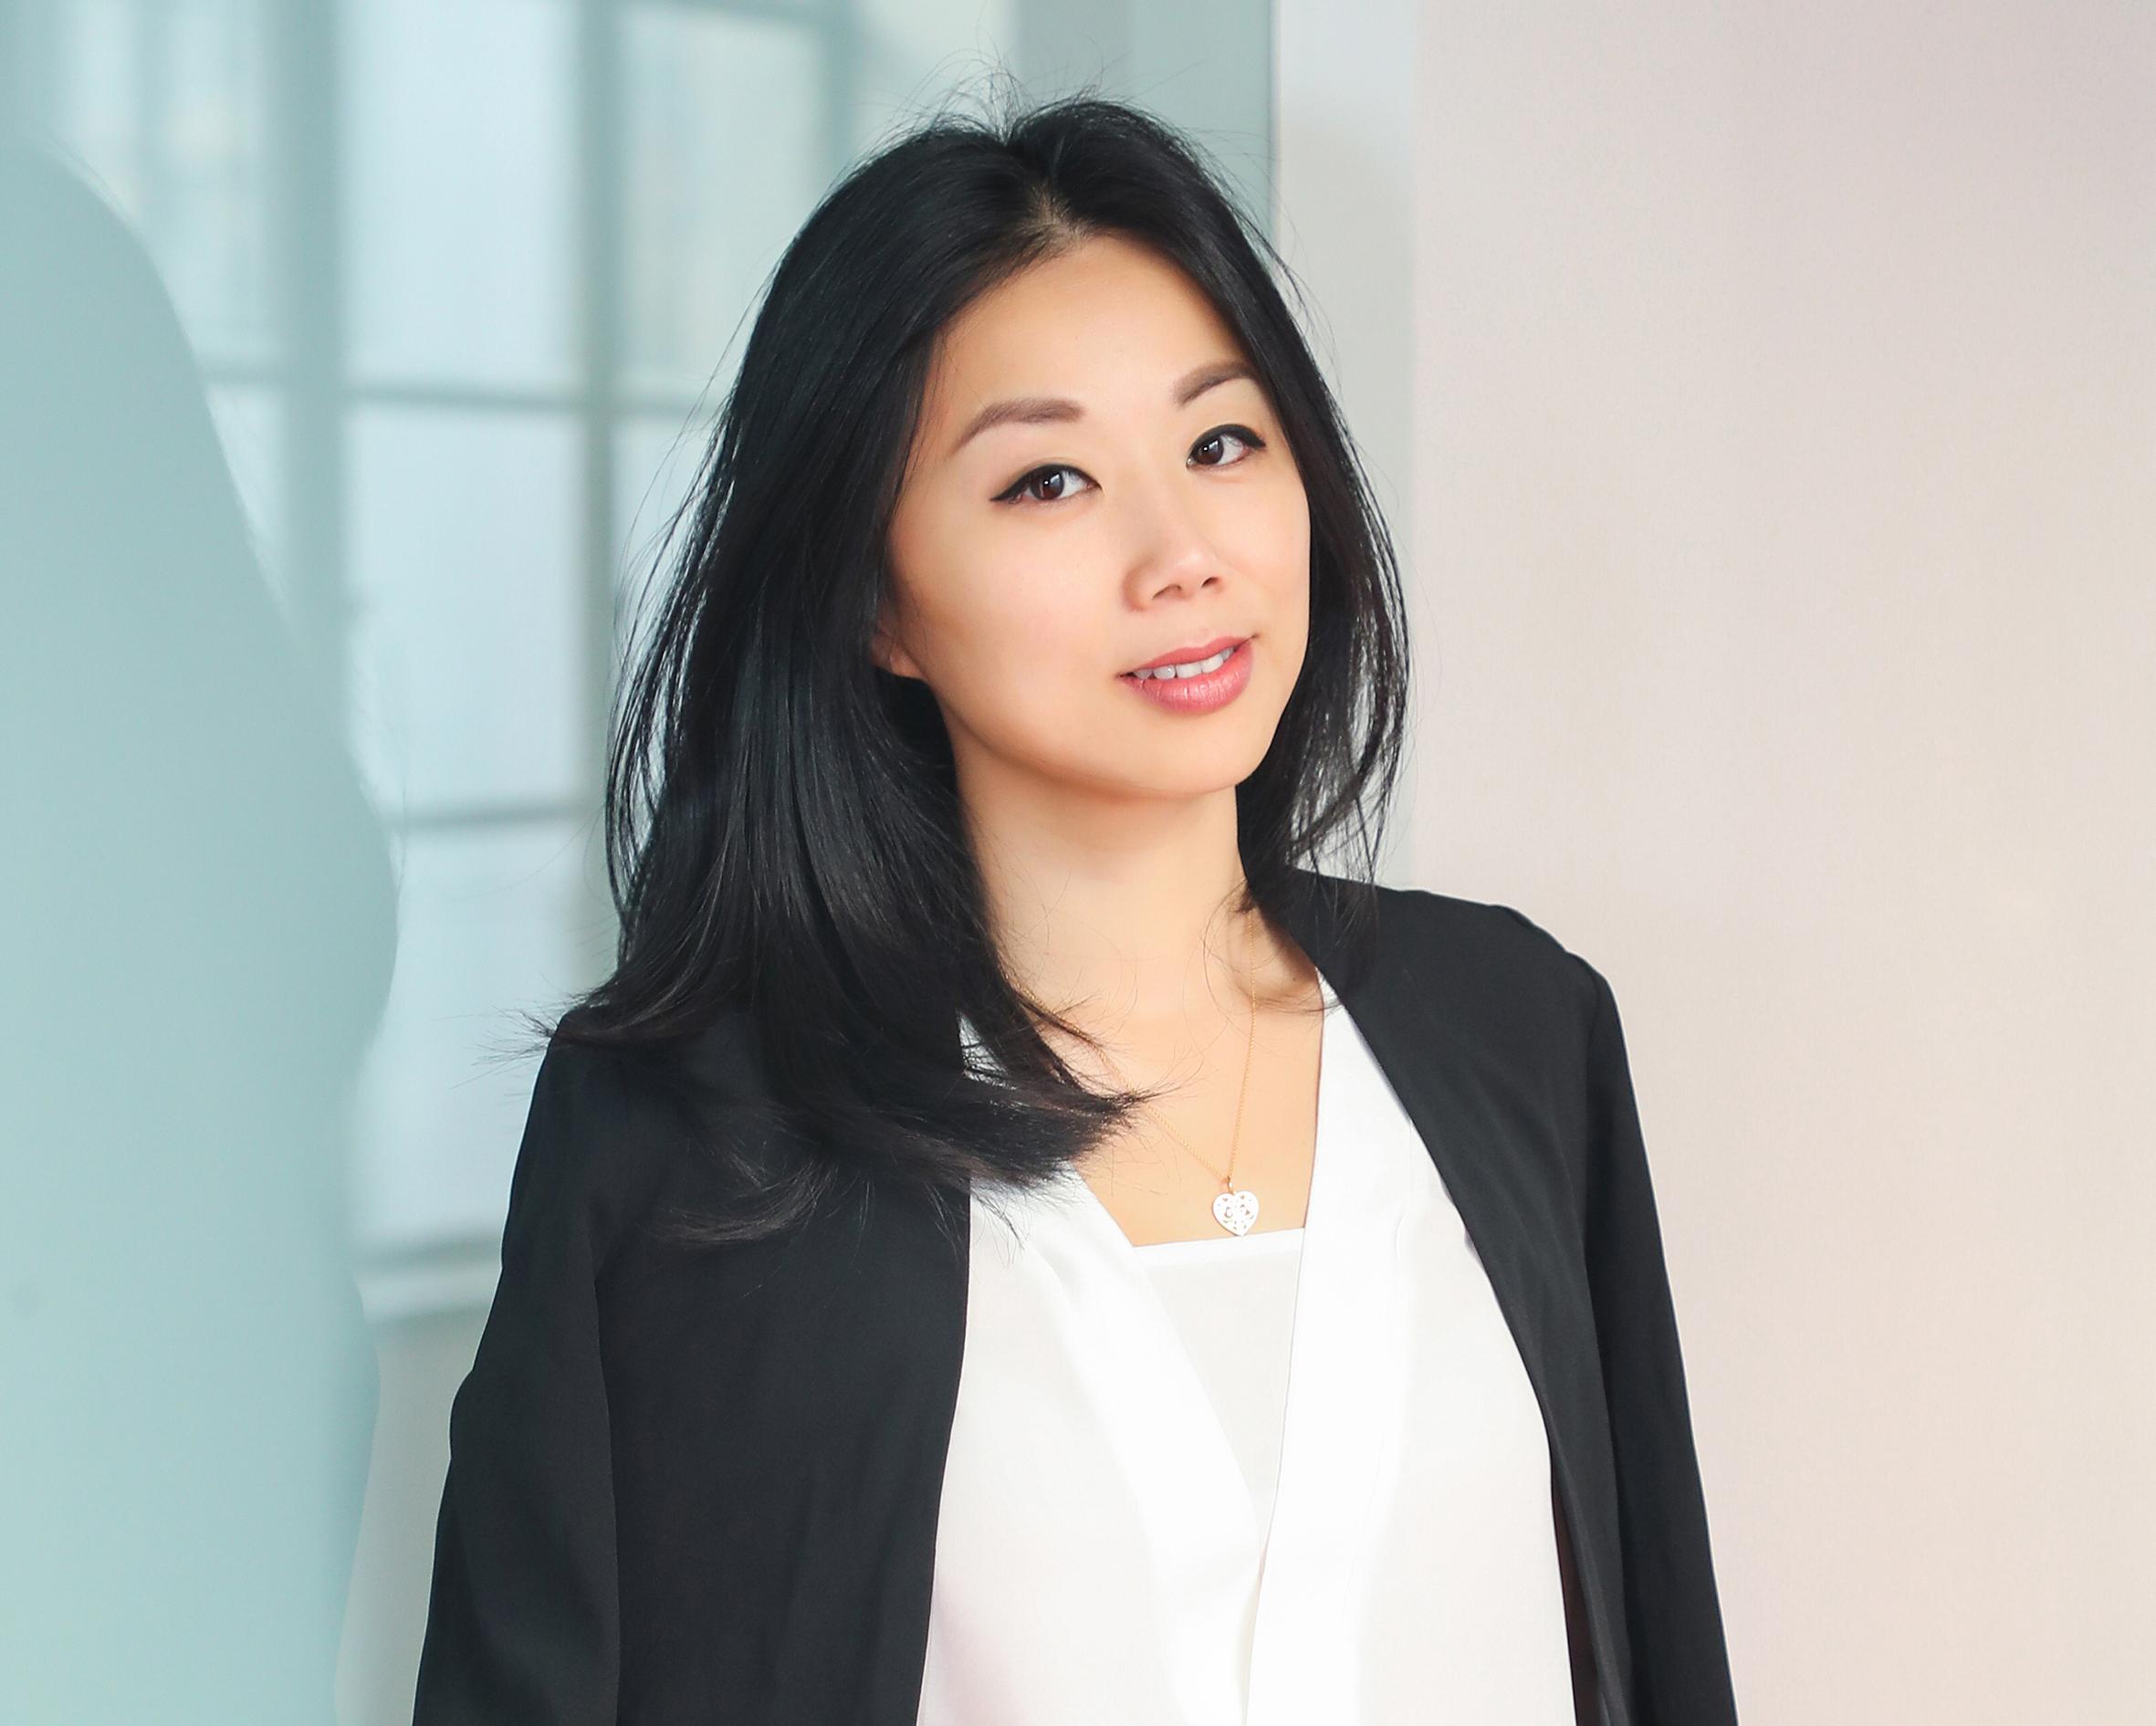 2019CCBF深度彰显国际范儿——专访博罗那展览(上海)有限公司总经理柴成炜